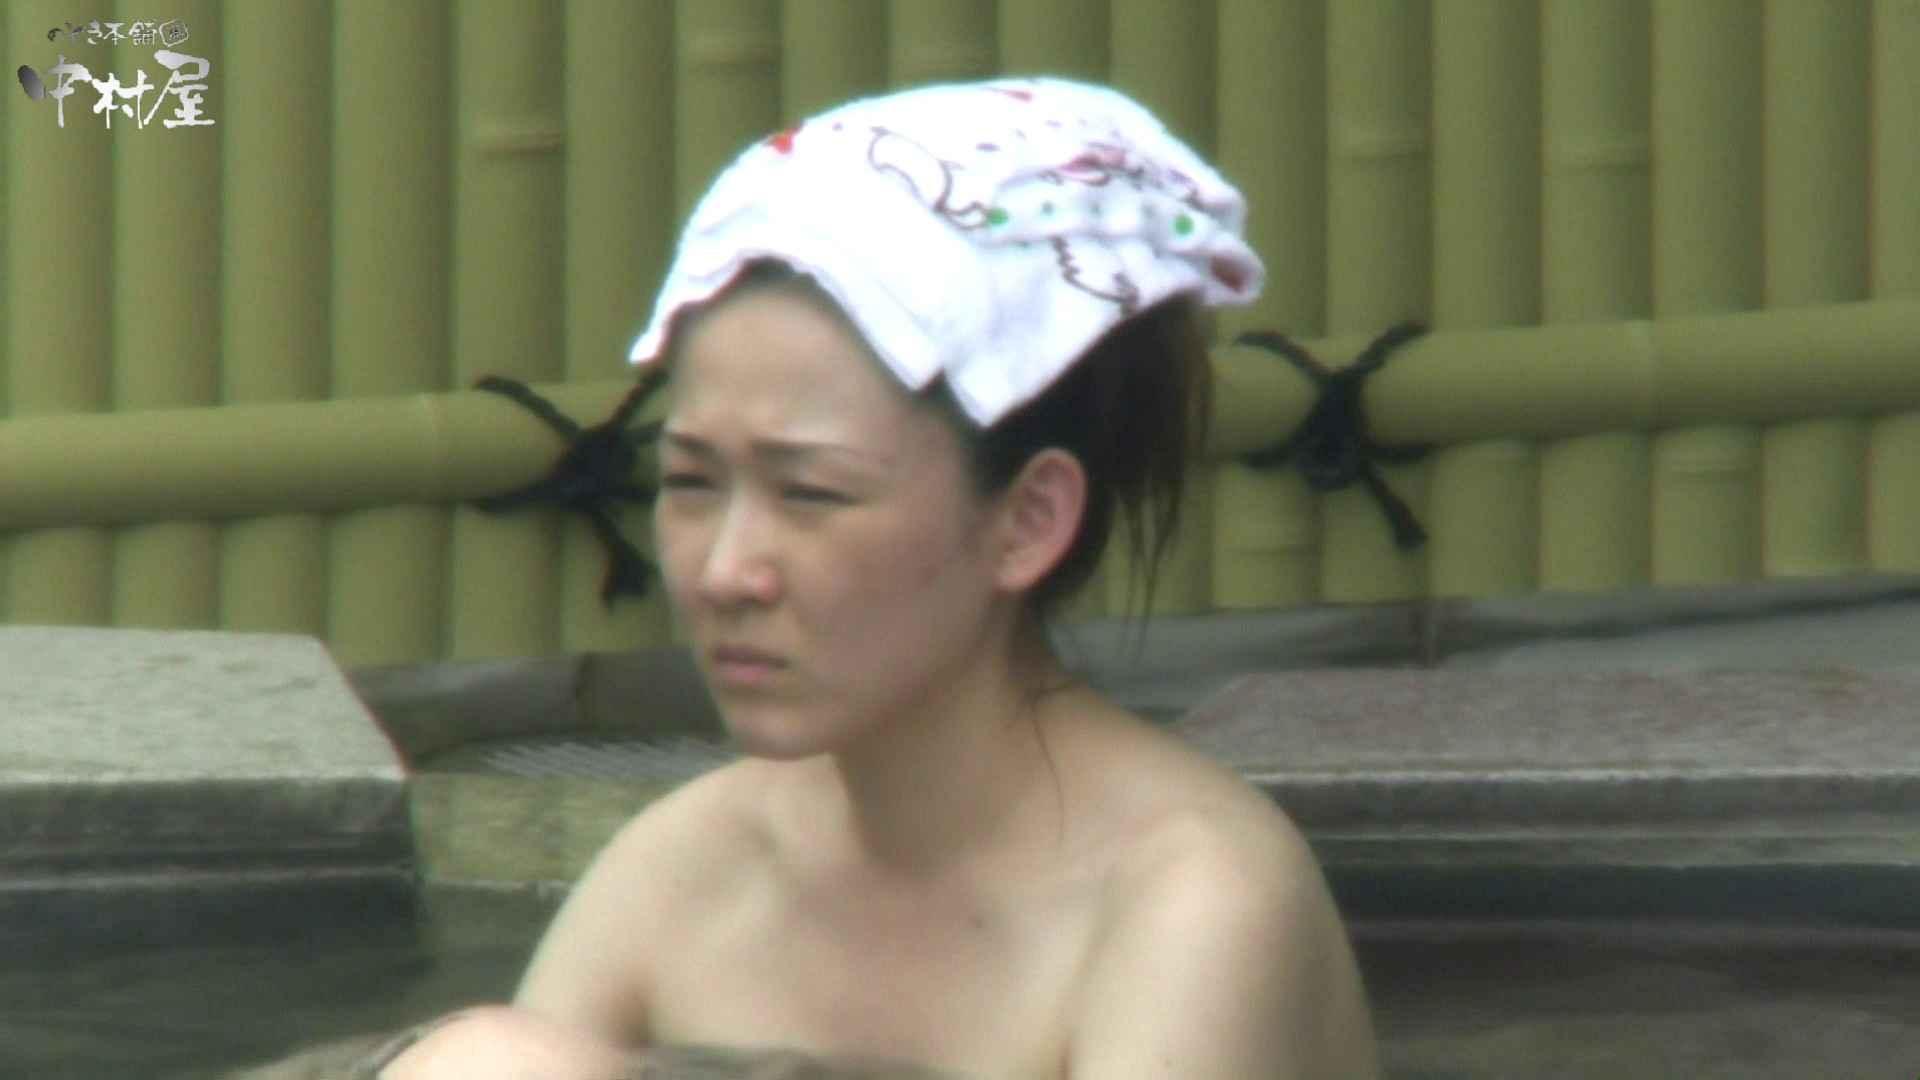 Aquaな露天風呂Vol.943 盗撮 セックス無修正動画無料 108画像 32